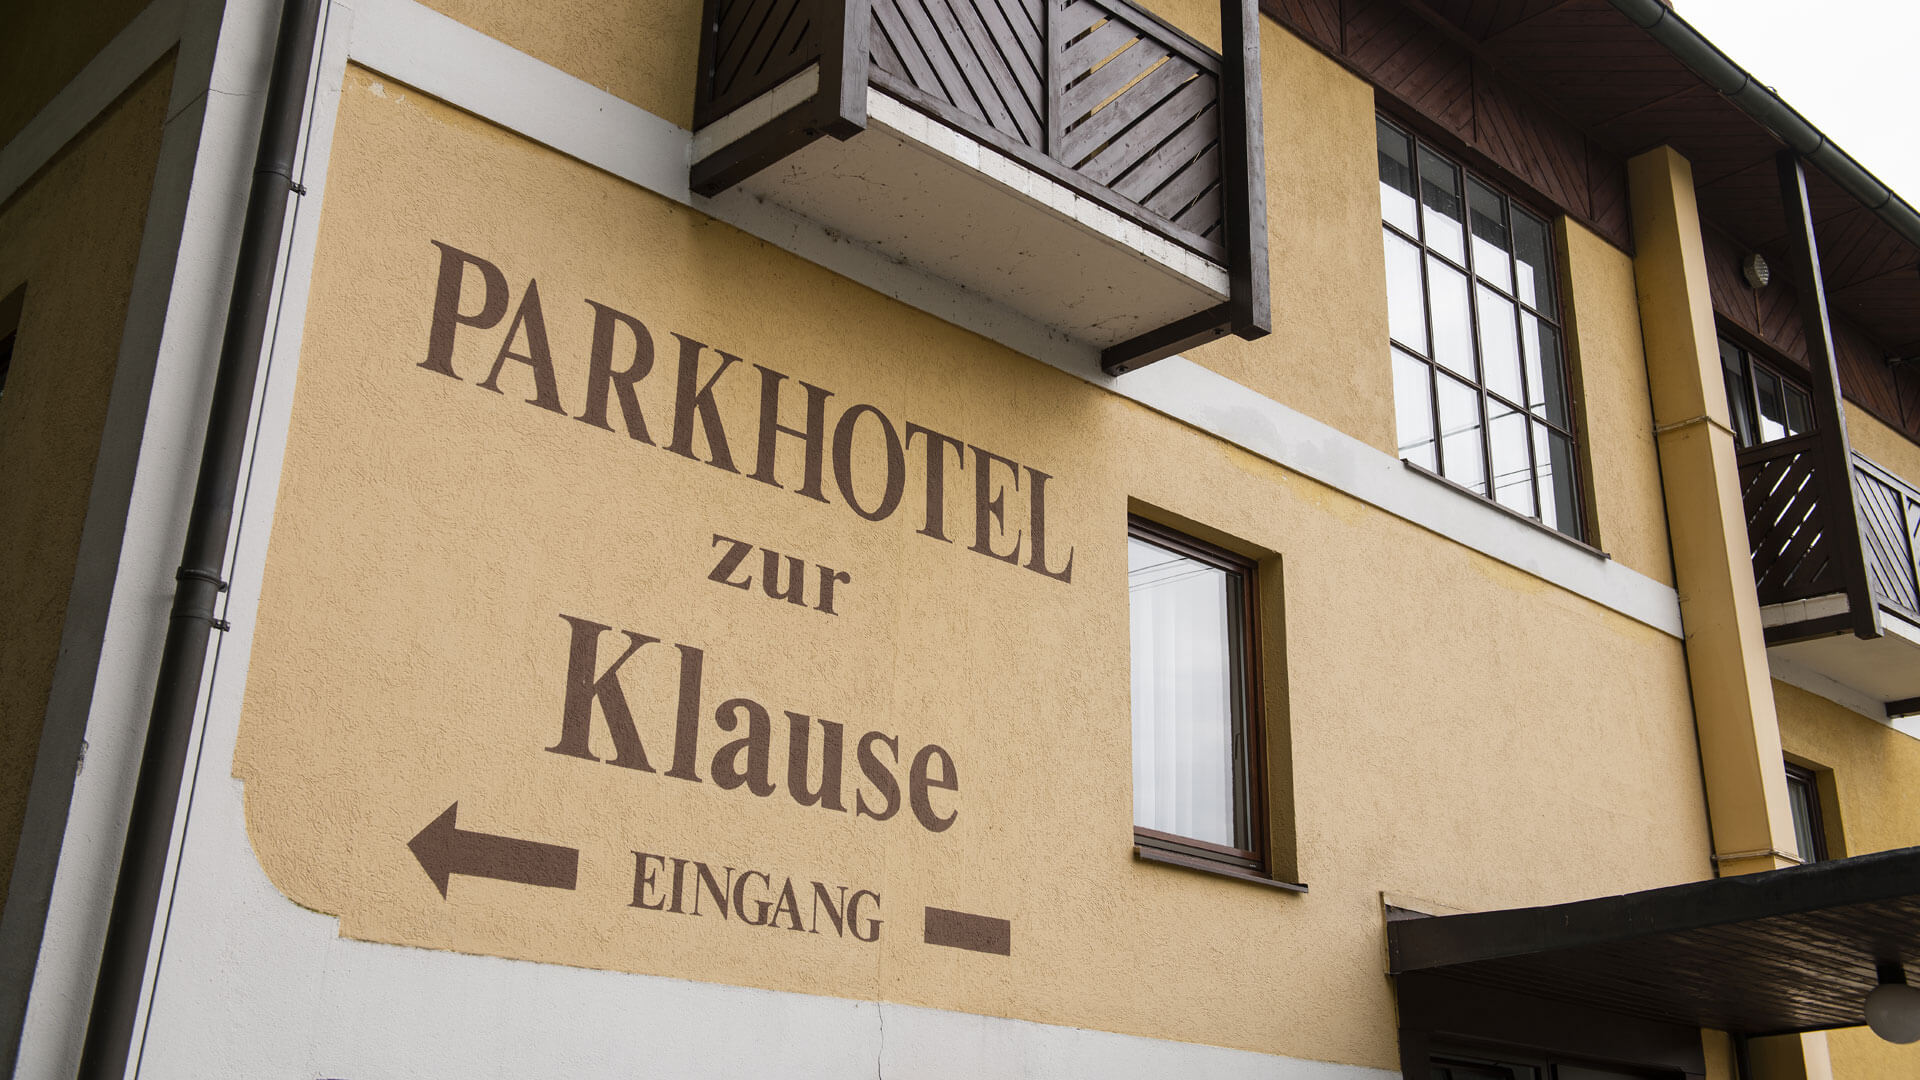 Parkhotel zur Klause in Bad Hall